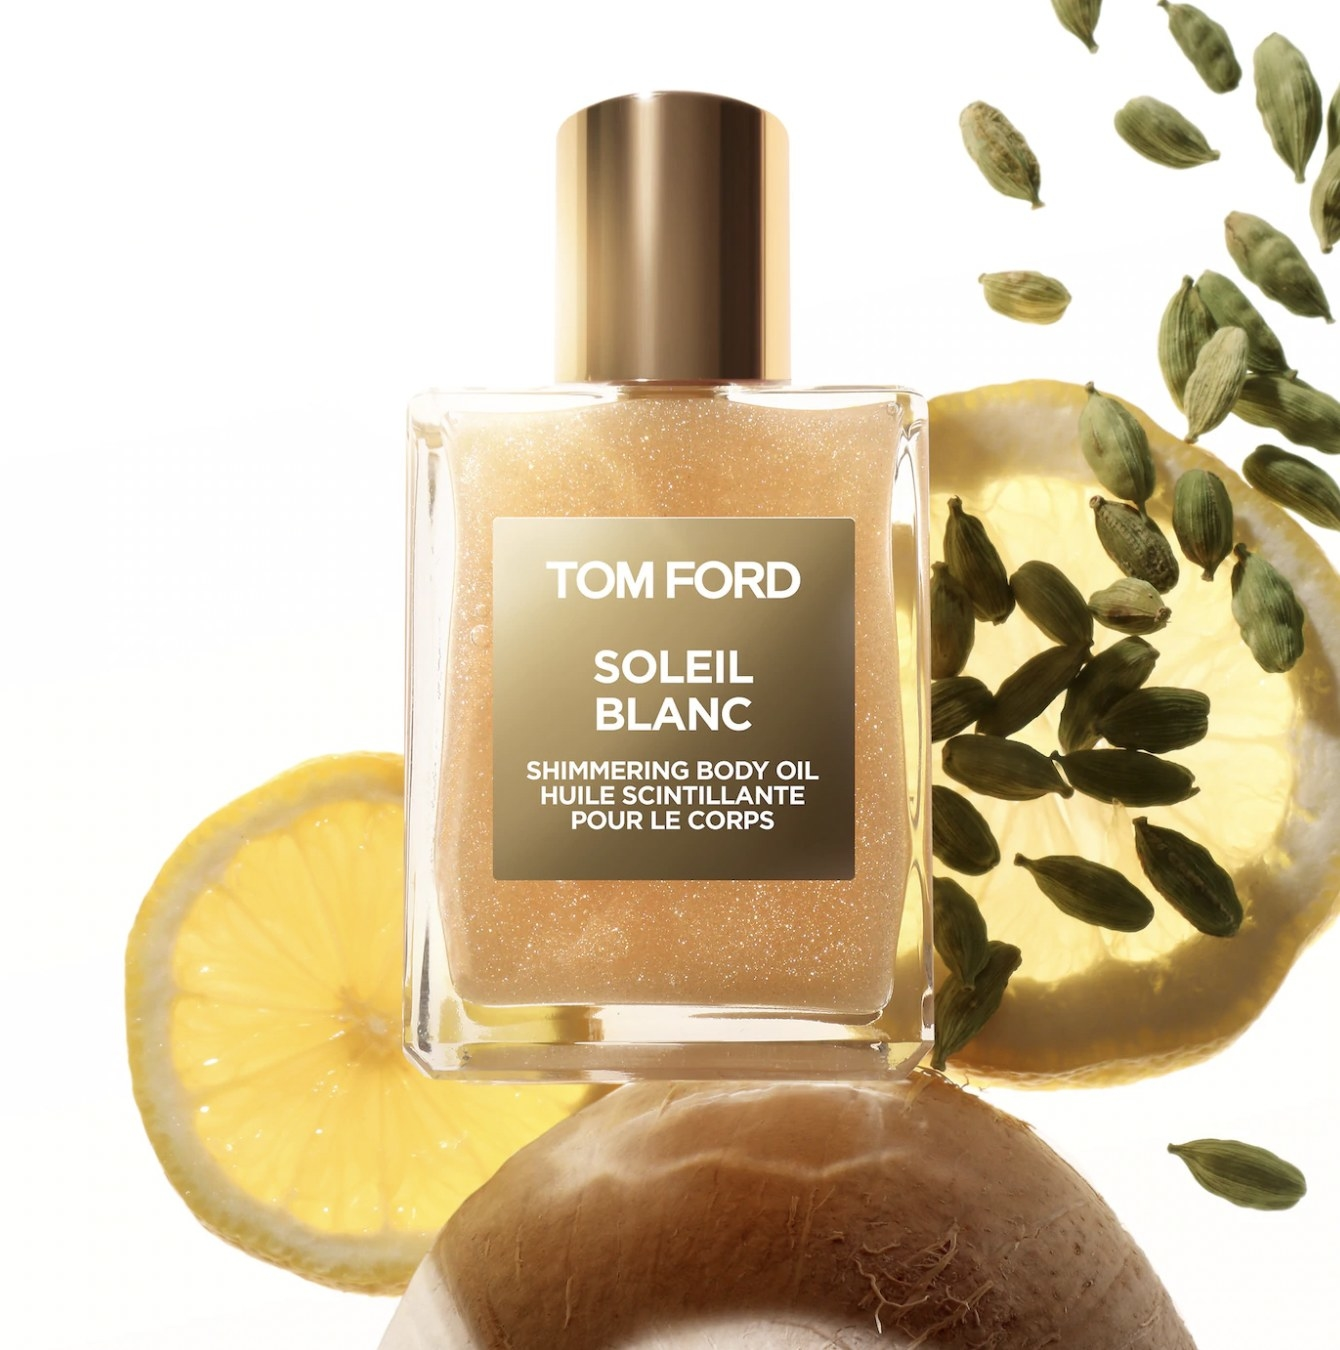 A bottle of shimmering body oil.